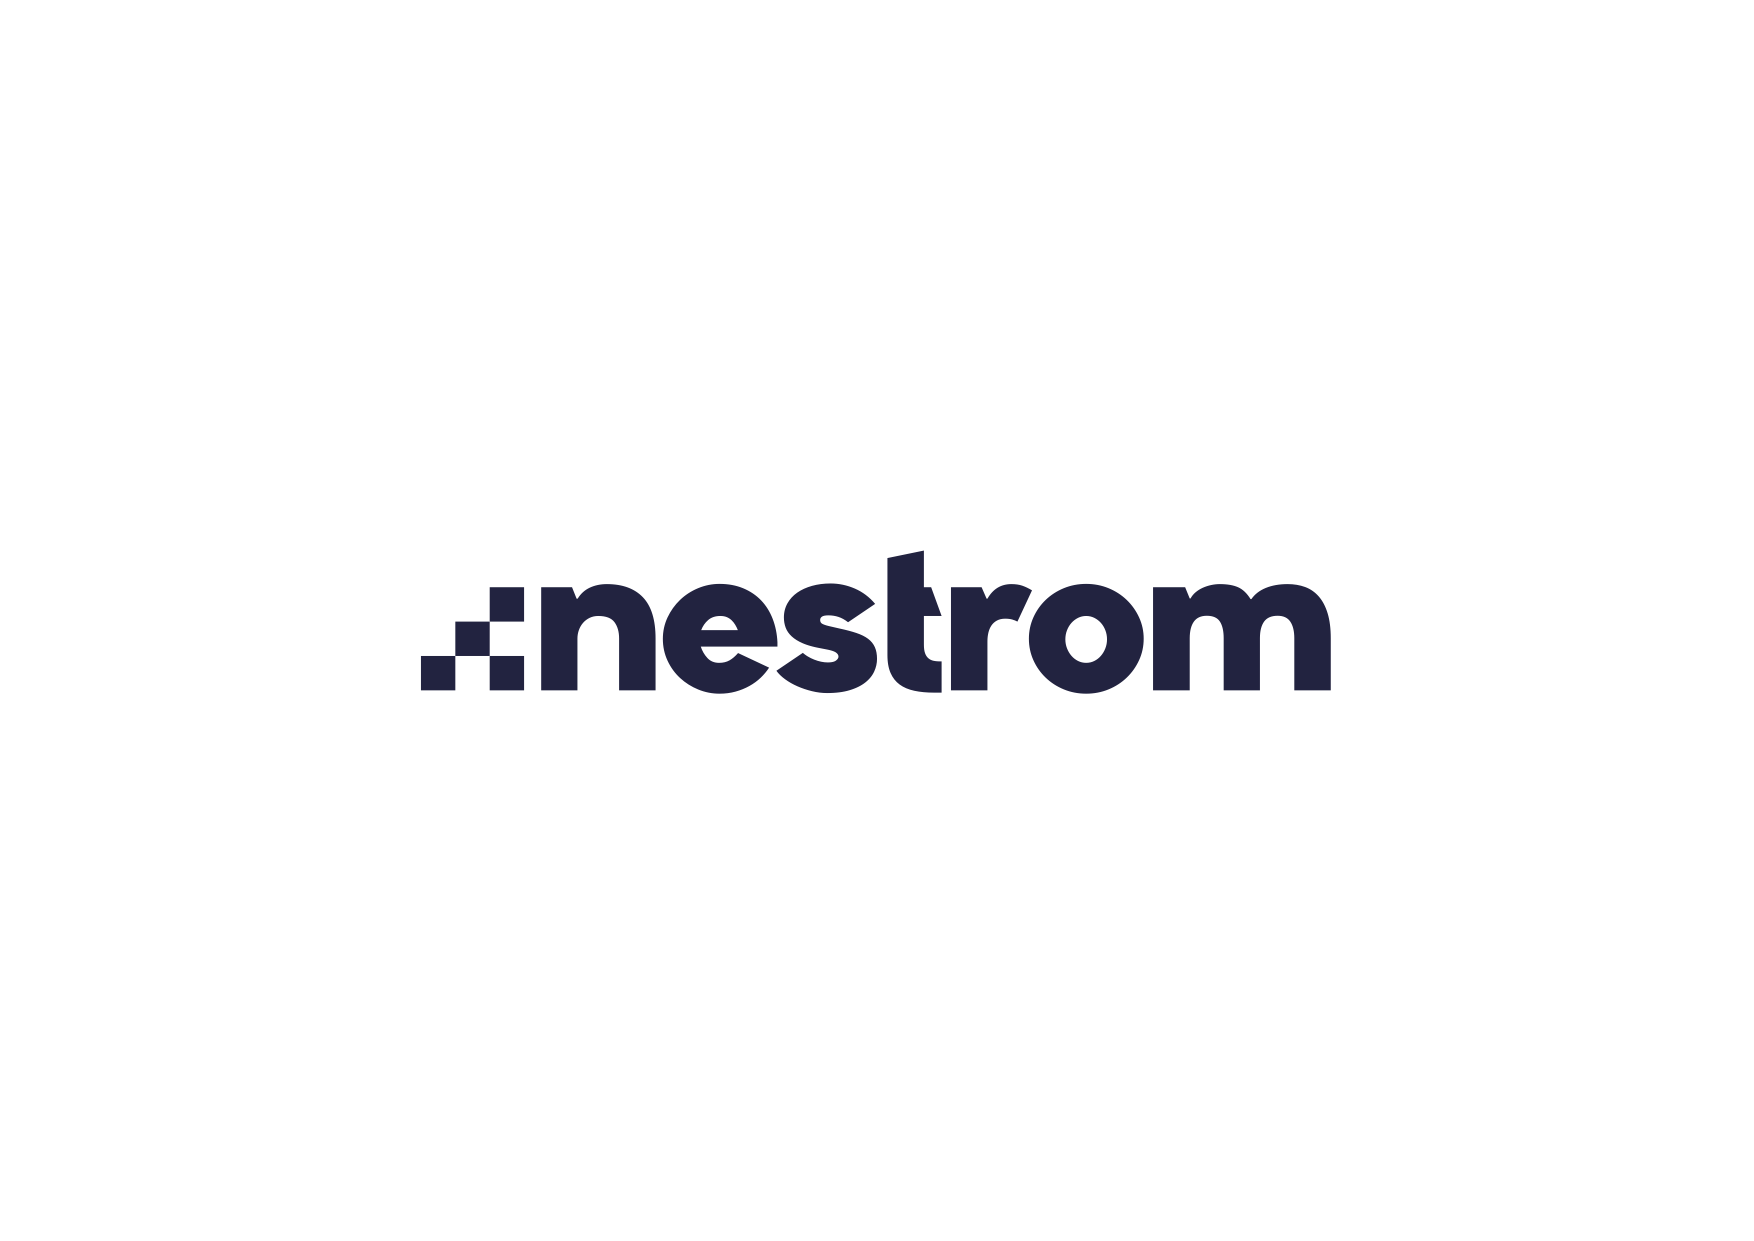 Nestrom.png